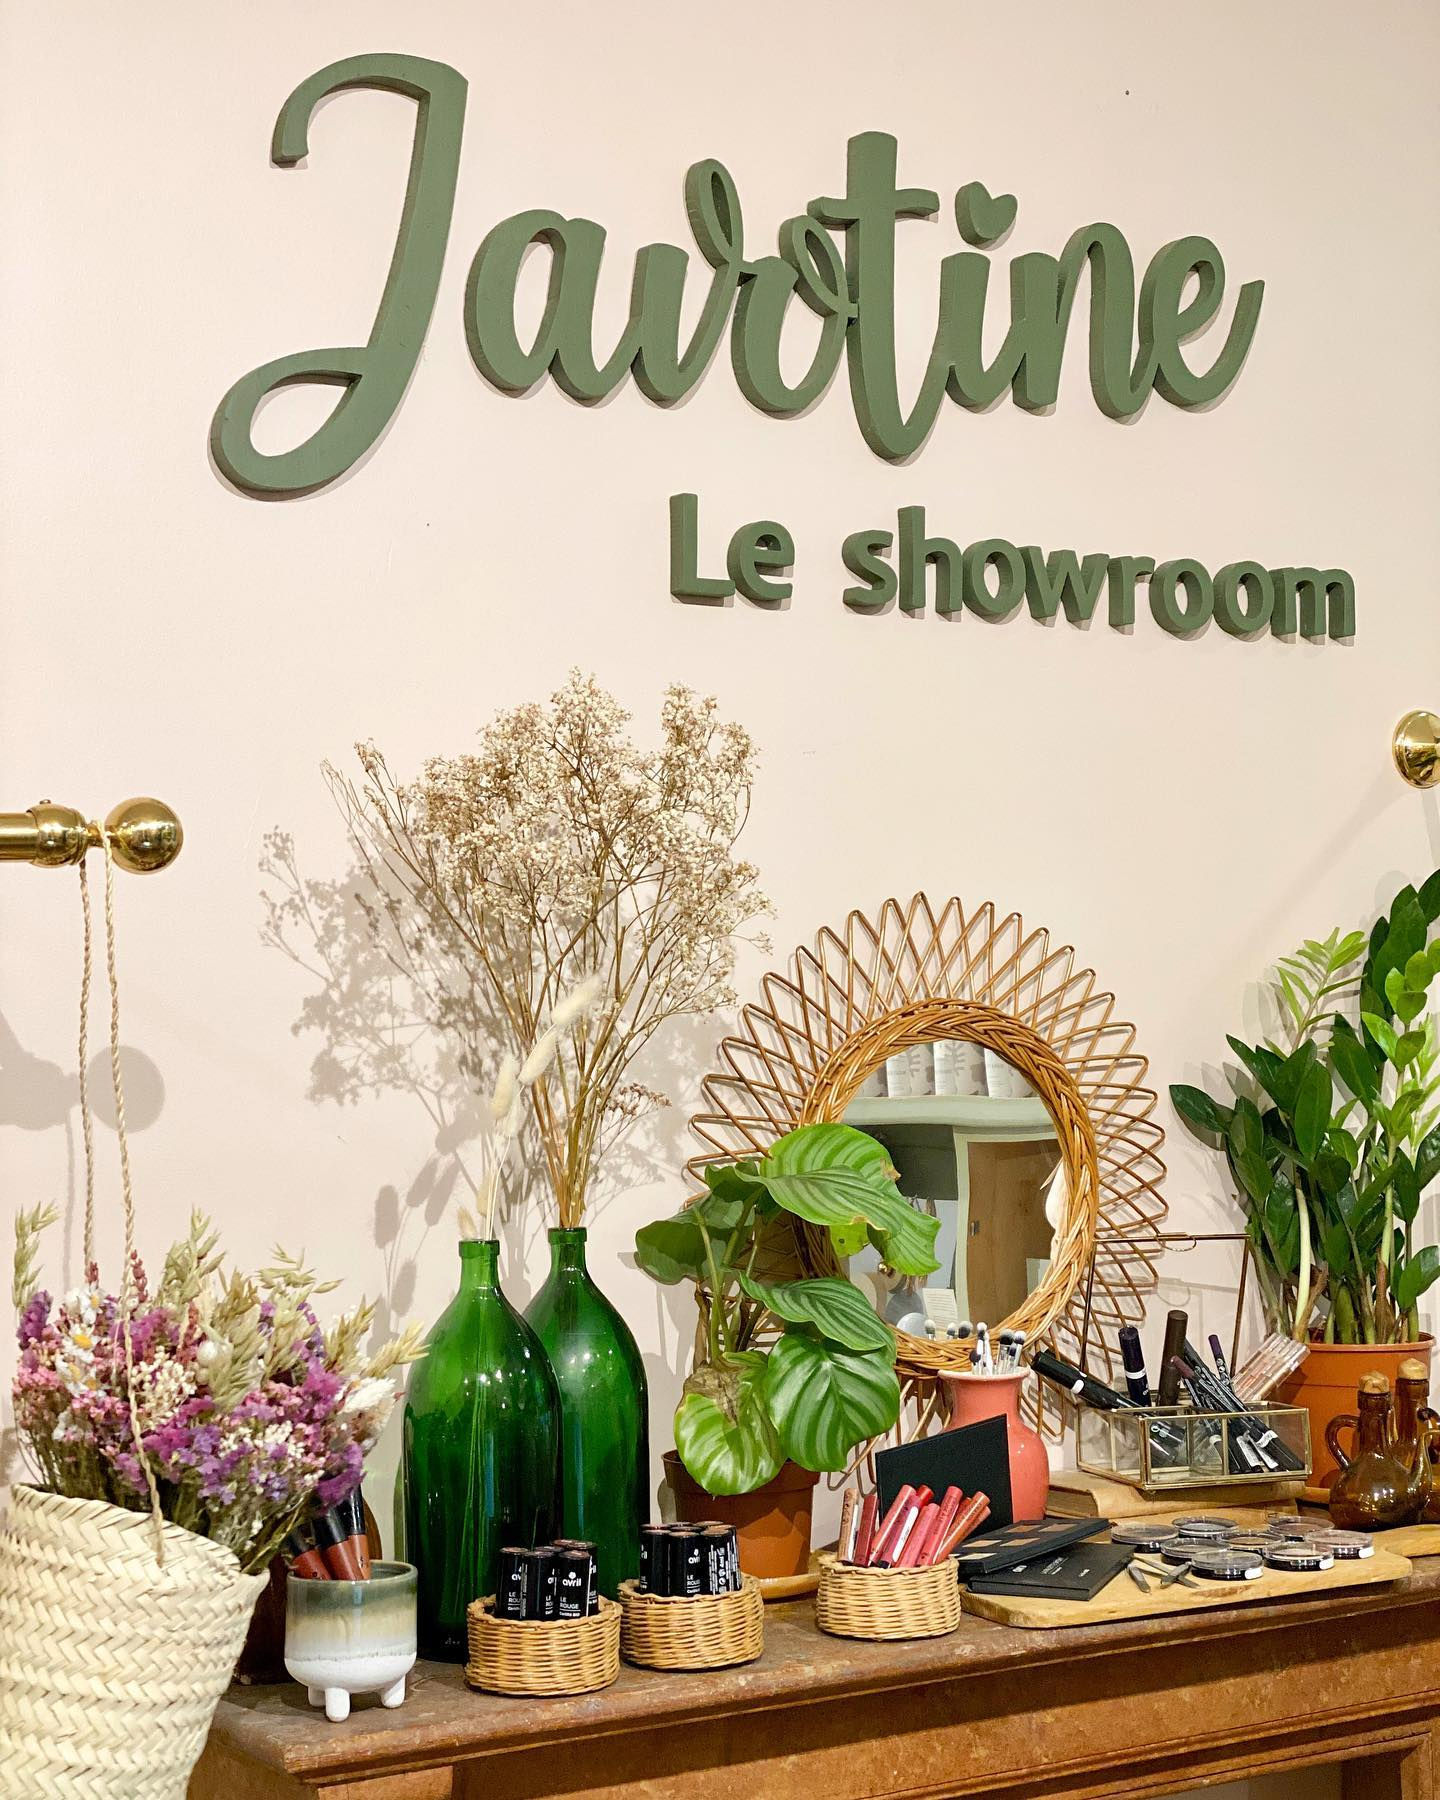 javotine_le_showroom_3.jpg